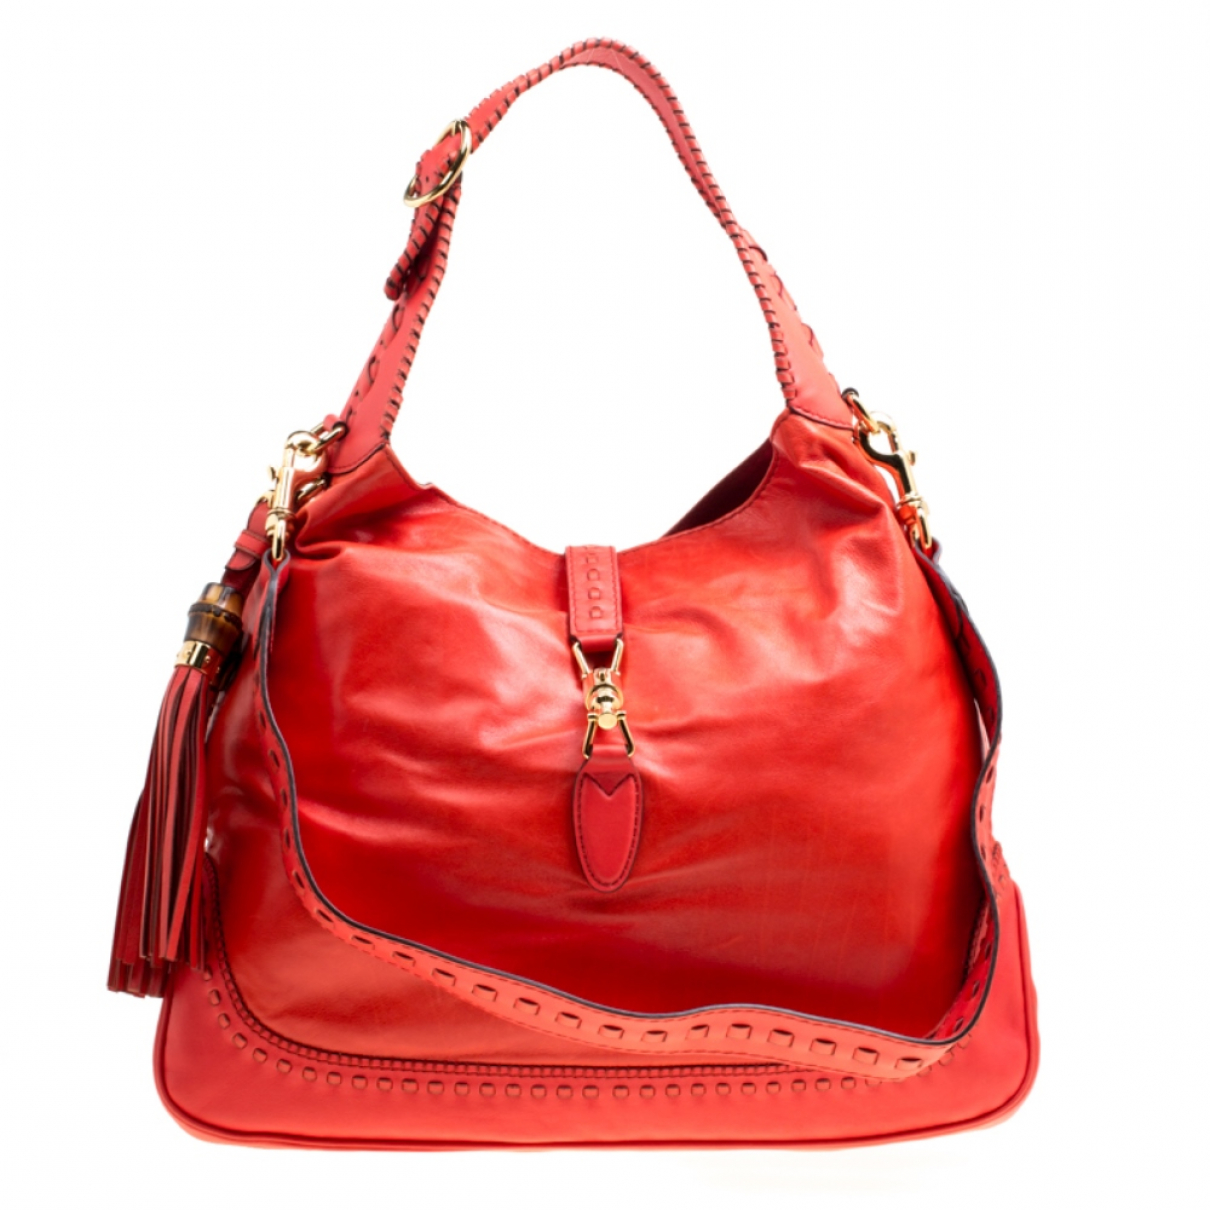 Gucci \N Red Leather handbag for Women \N